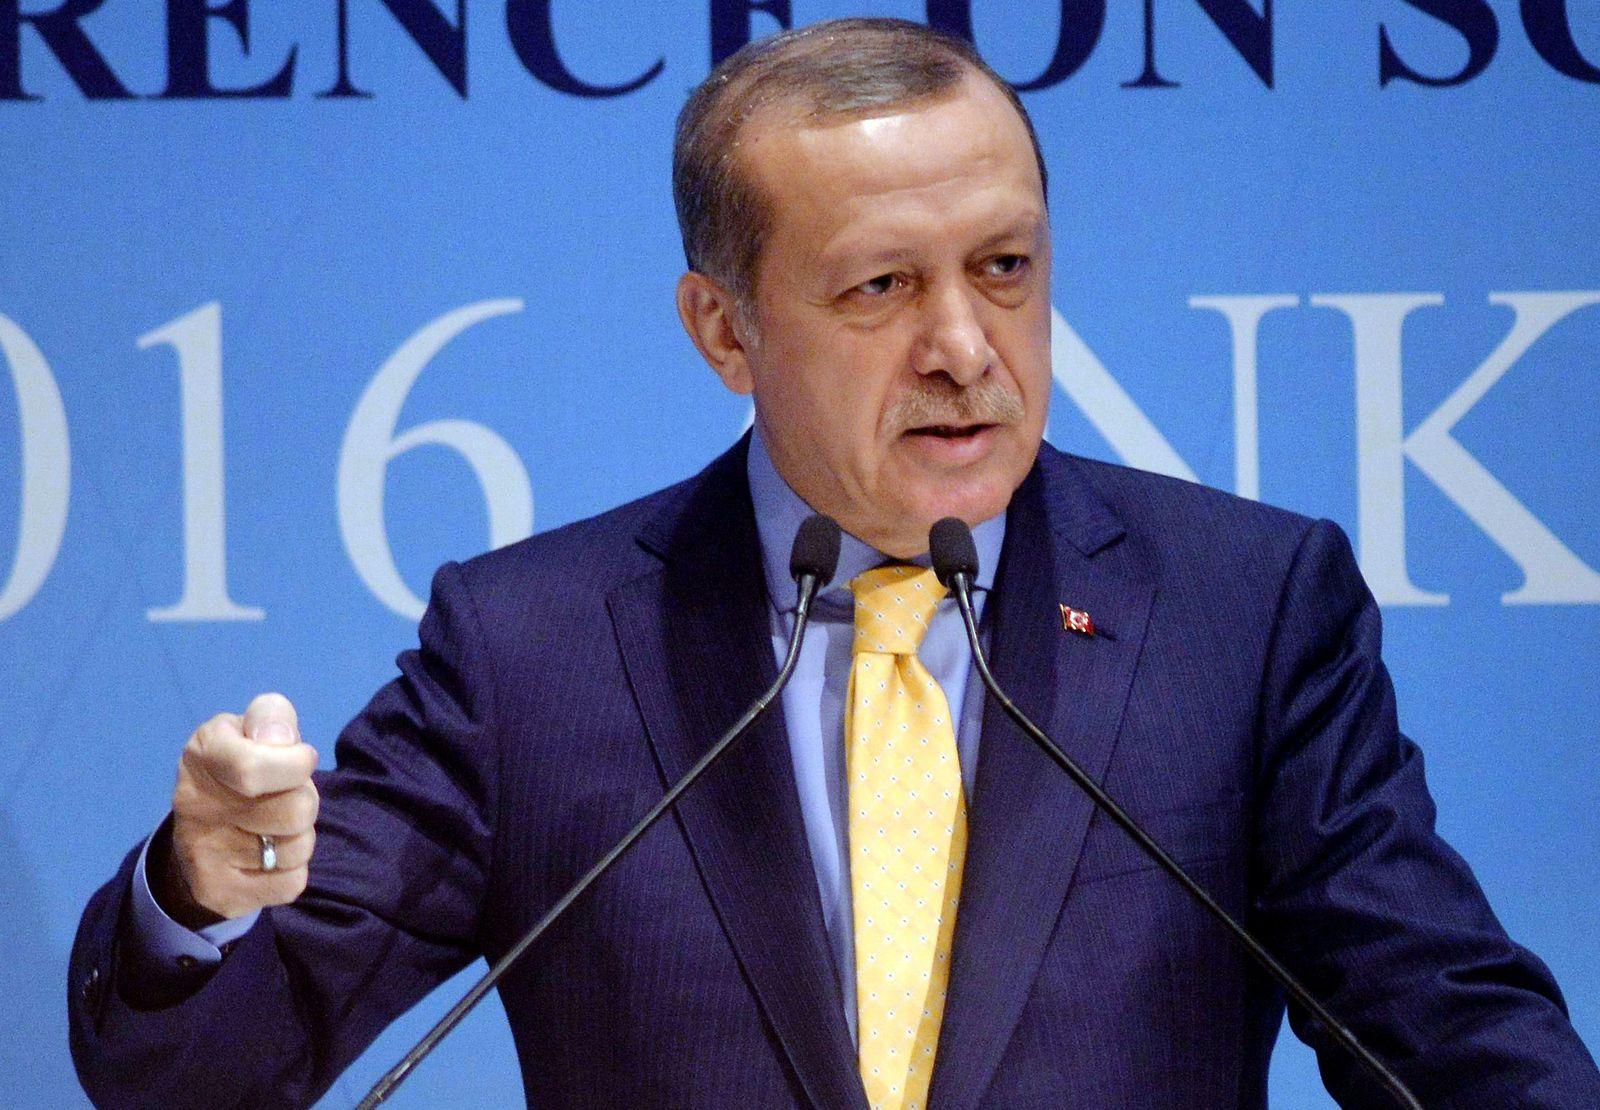 TURKEY-POLITICS-SCIENCE